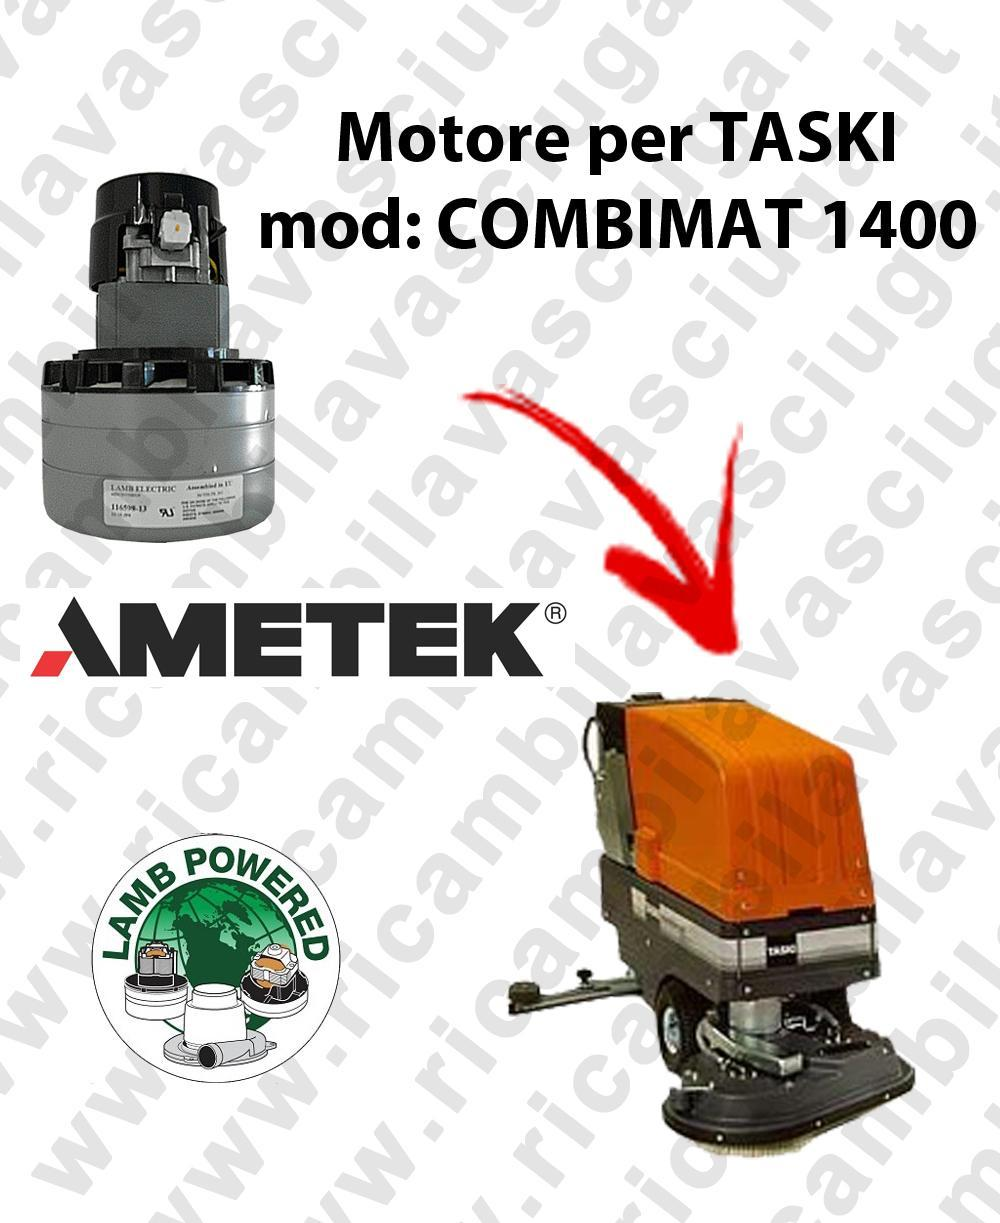 COMBIMAT 1400 Motore de aspiración LAMB AMETEK para fregadora TASKI